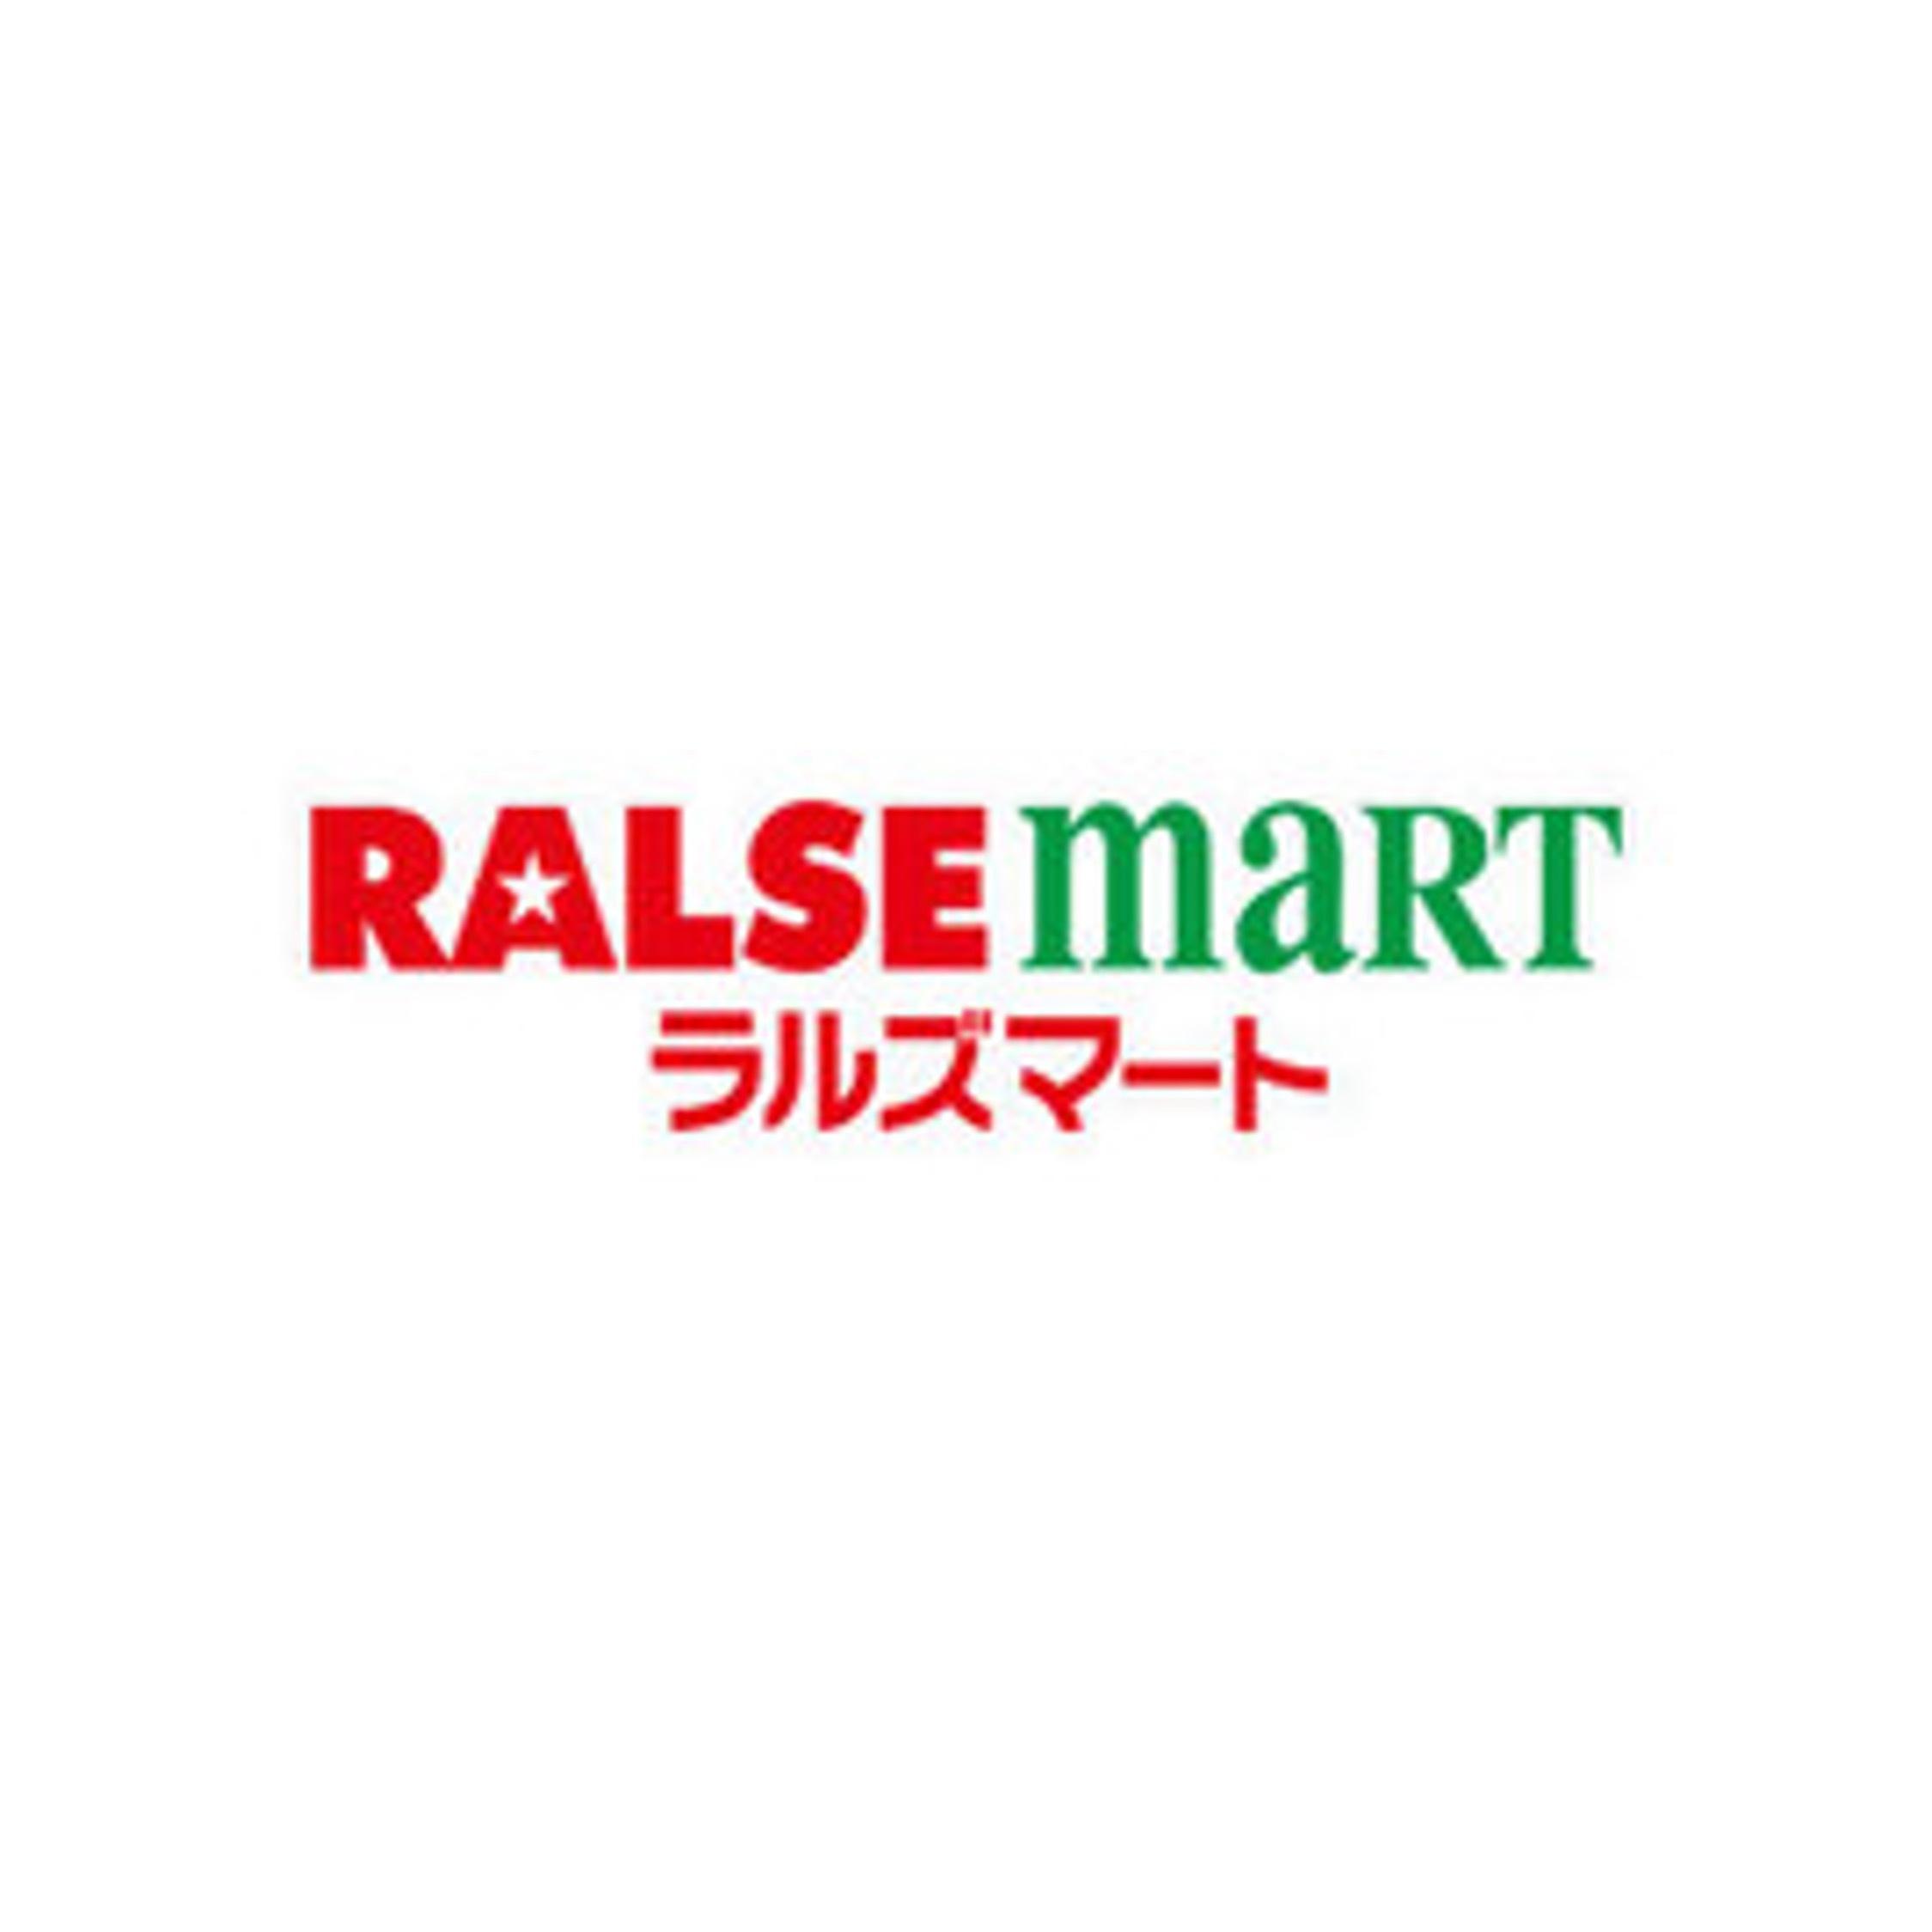 Logo ralsemart